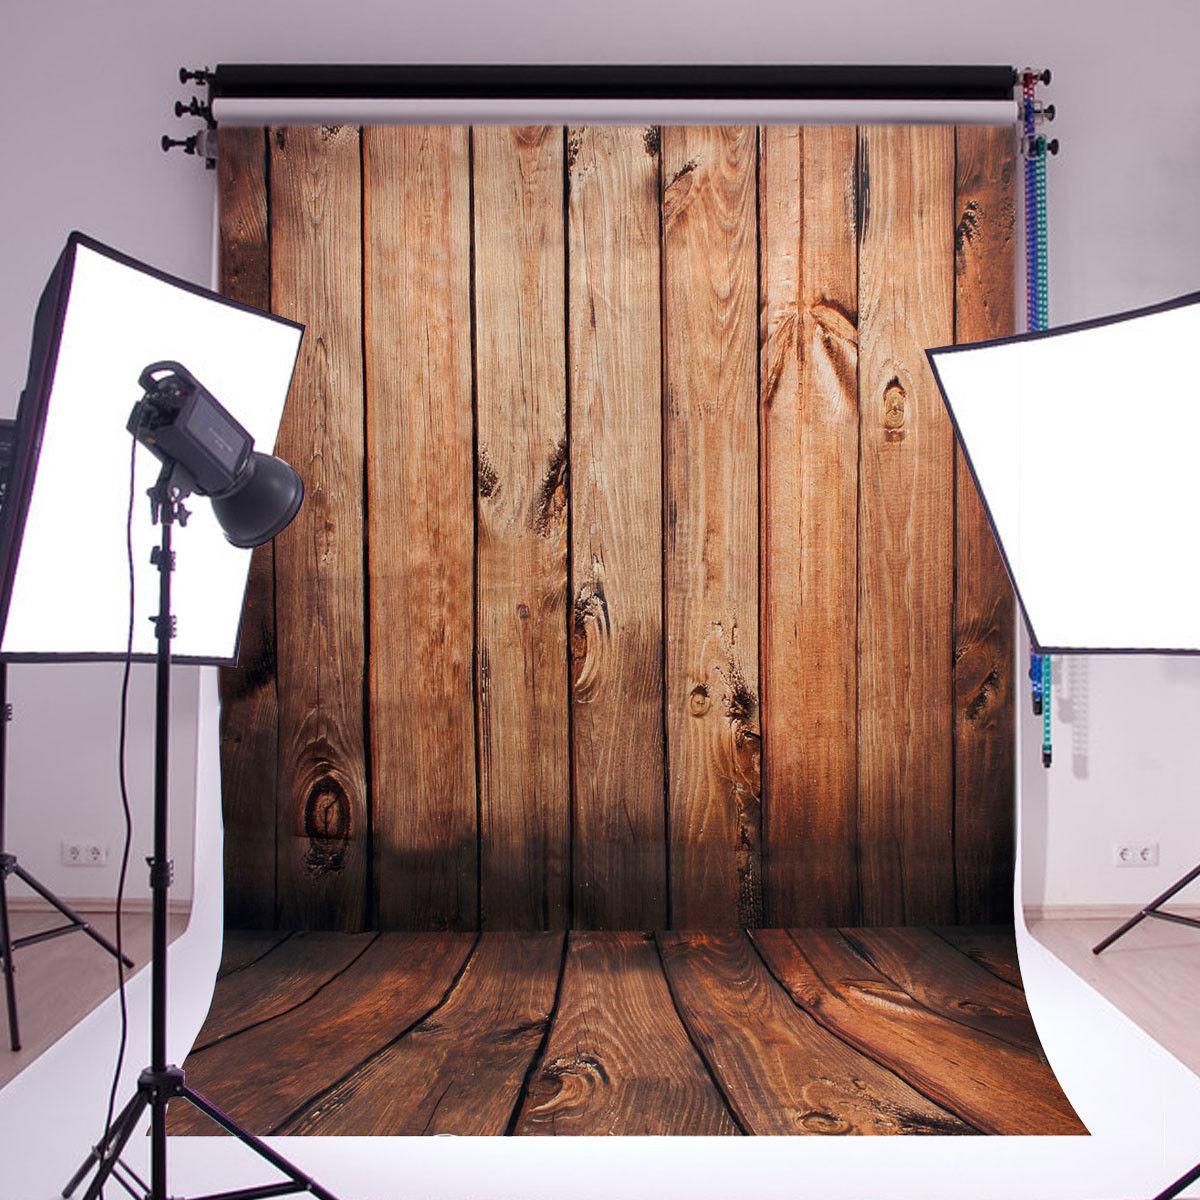 5*7FT Wood Floor Subject Photography Backdrop Digital Screen For Indoor Photograph Wood Grain  Backdrop Fantasy <br><br>Aliexpress